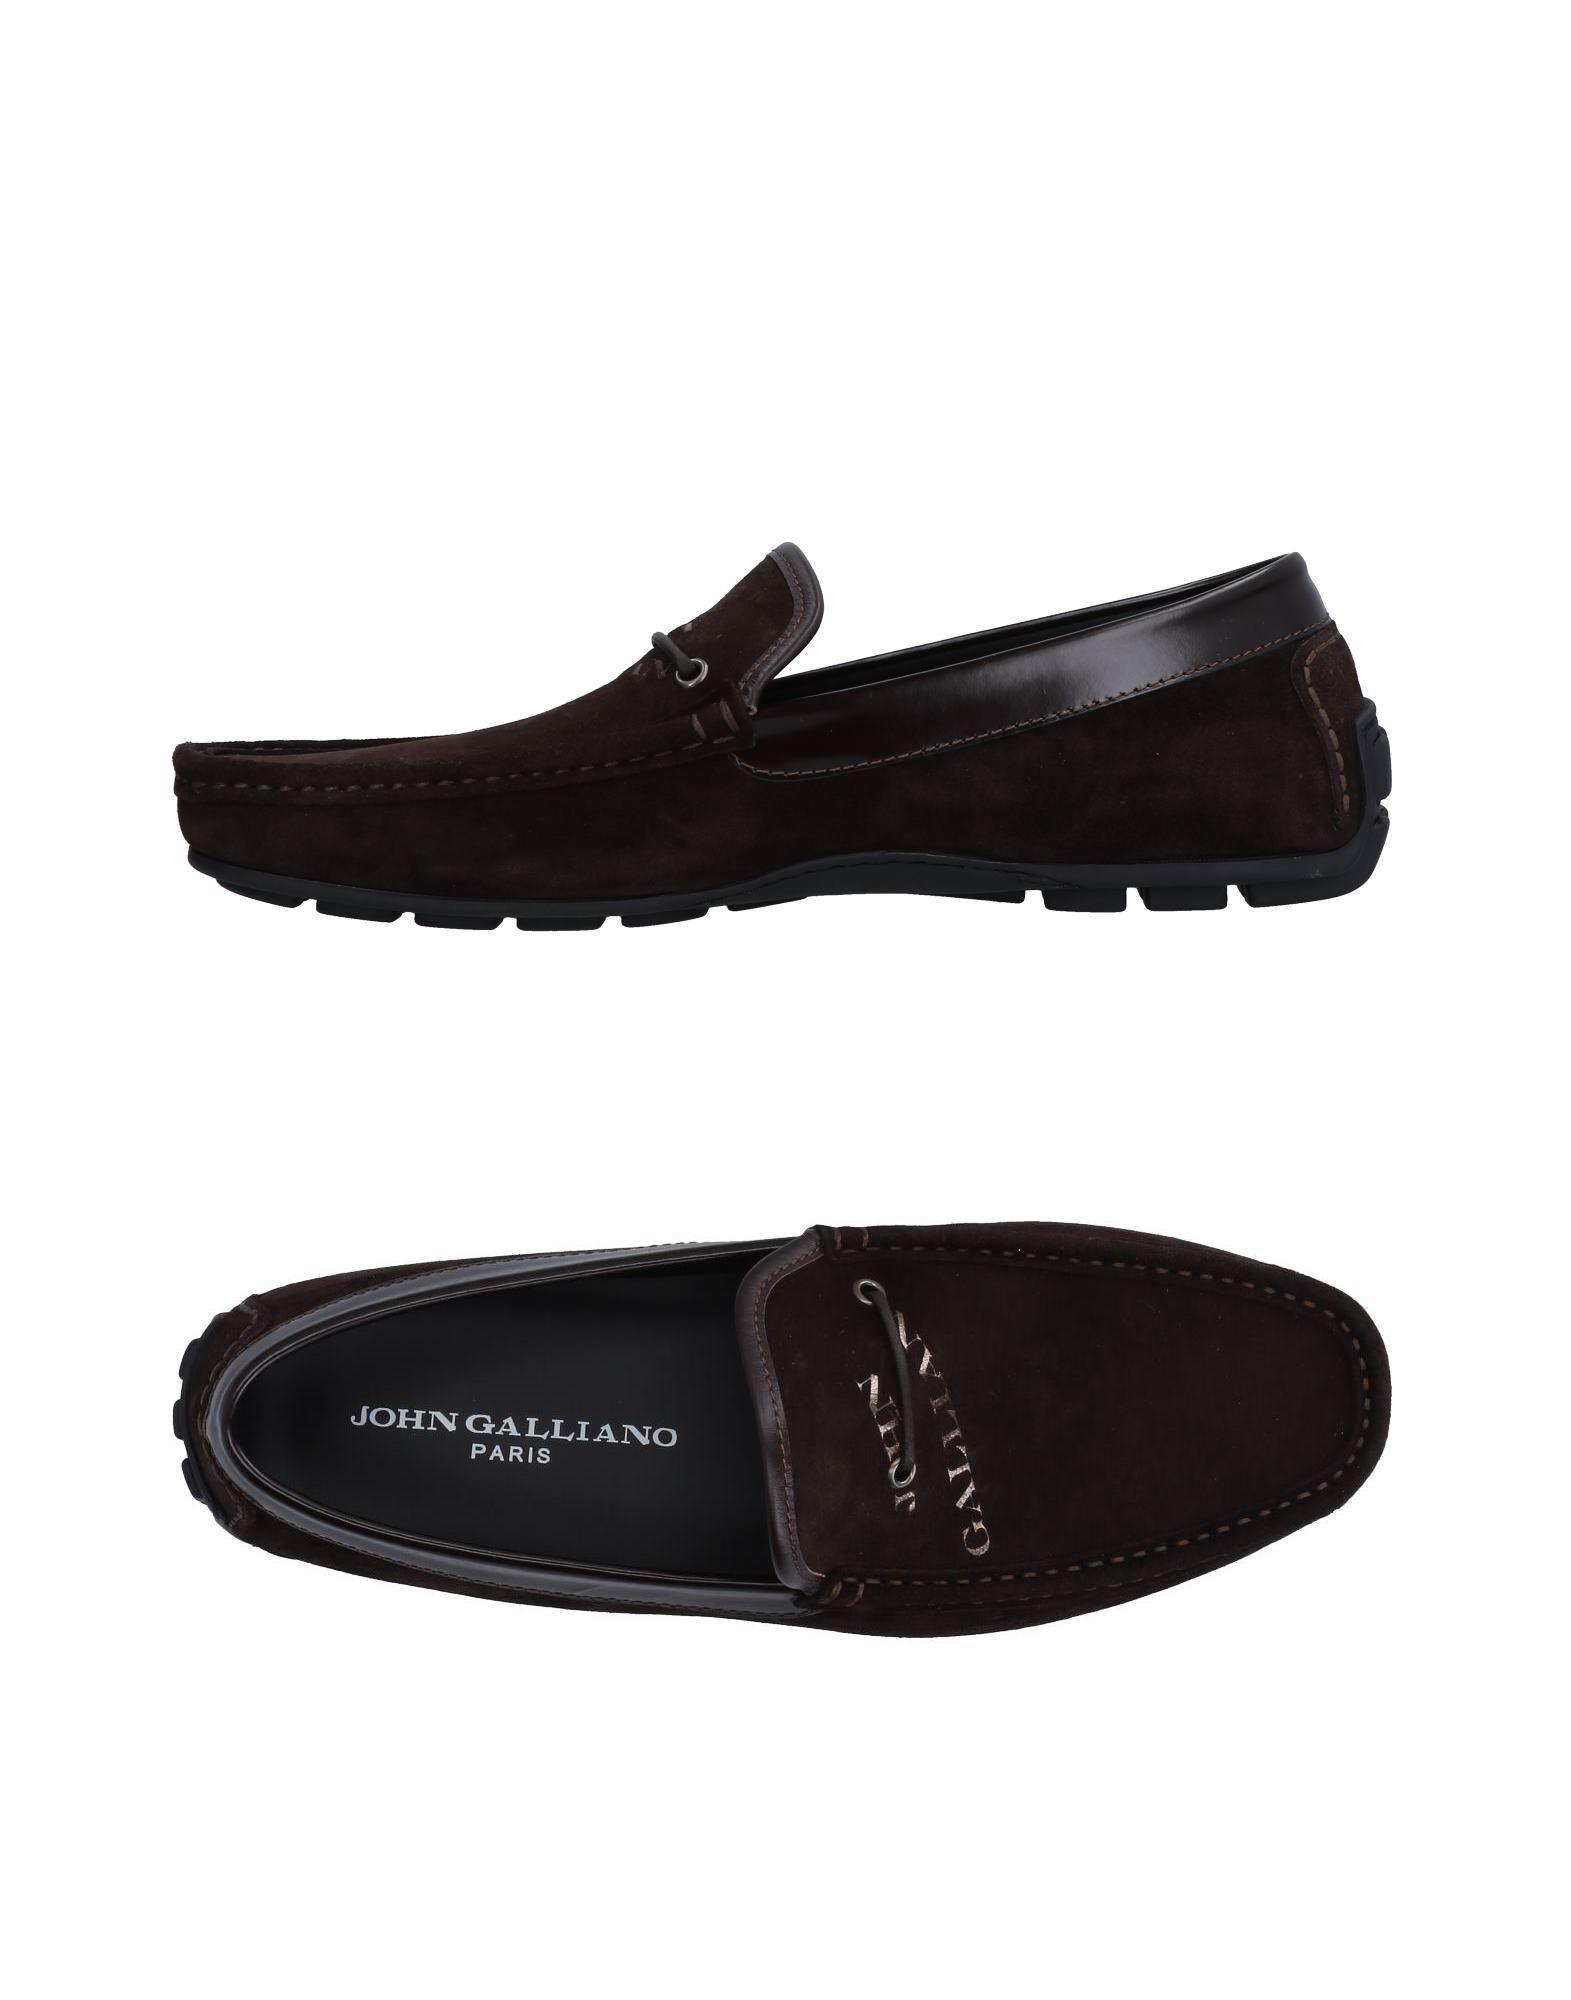 John Galliano Mokassins Herren  11516733WB Gute Qualität beliebte Schuhe